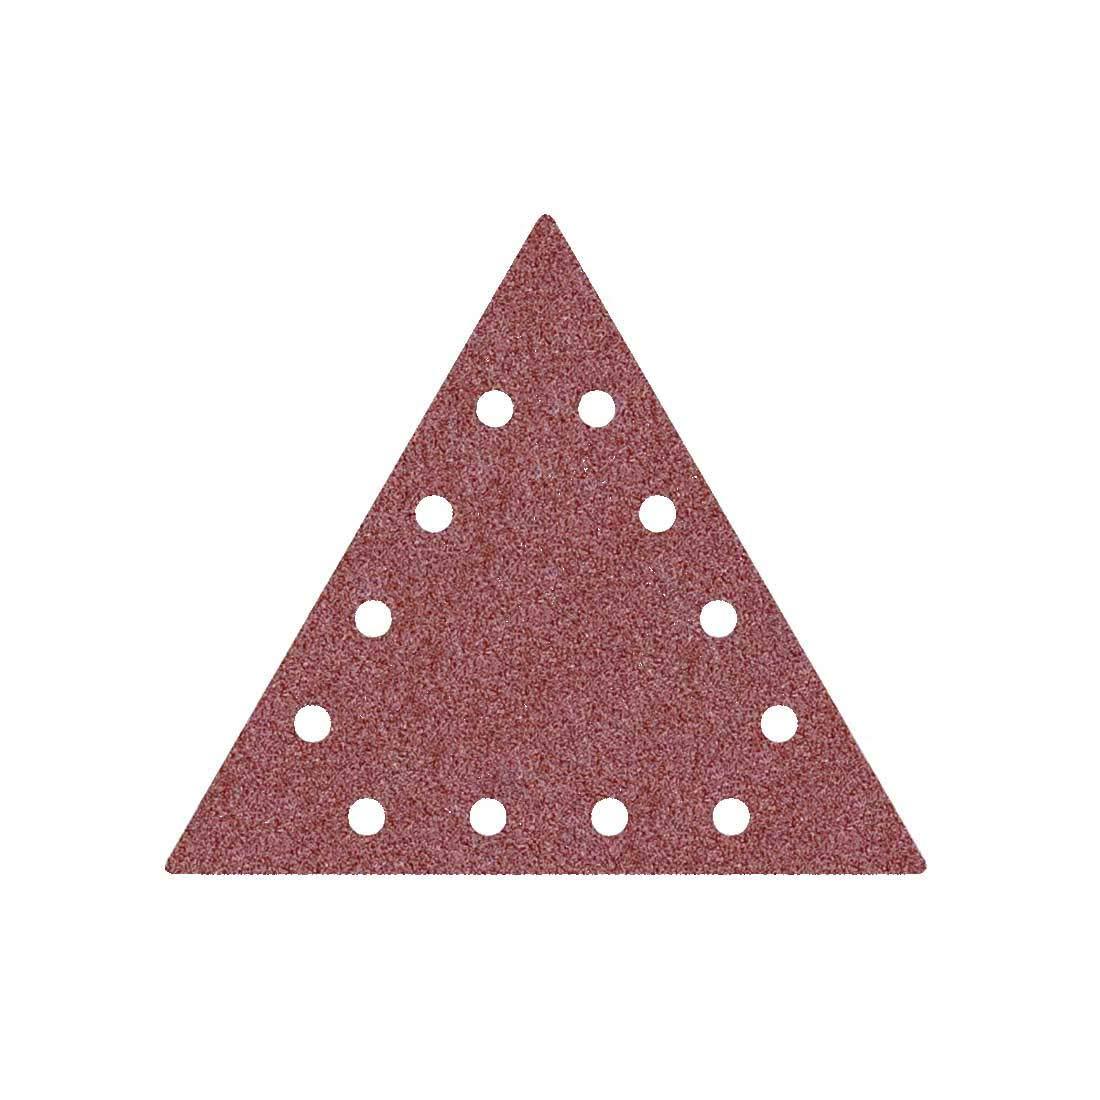 25 Dischi abrasivi autoadesivi MioTools per levigatrice per muri Grana 240-12 fori 290 x 250 mm